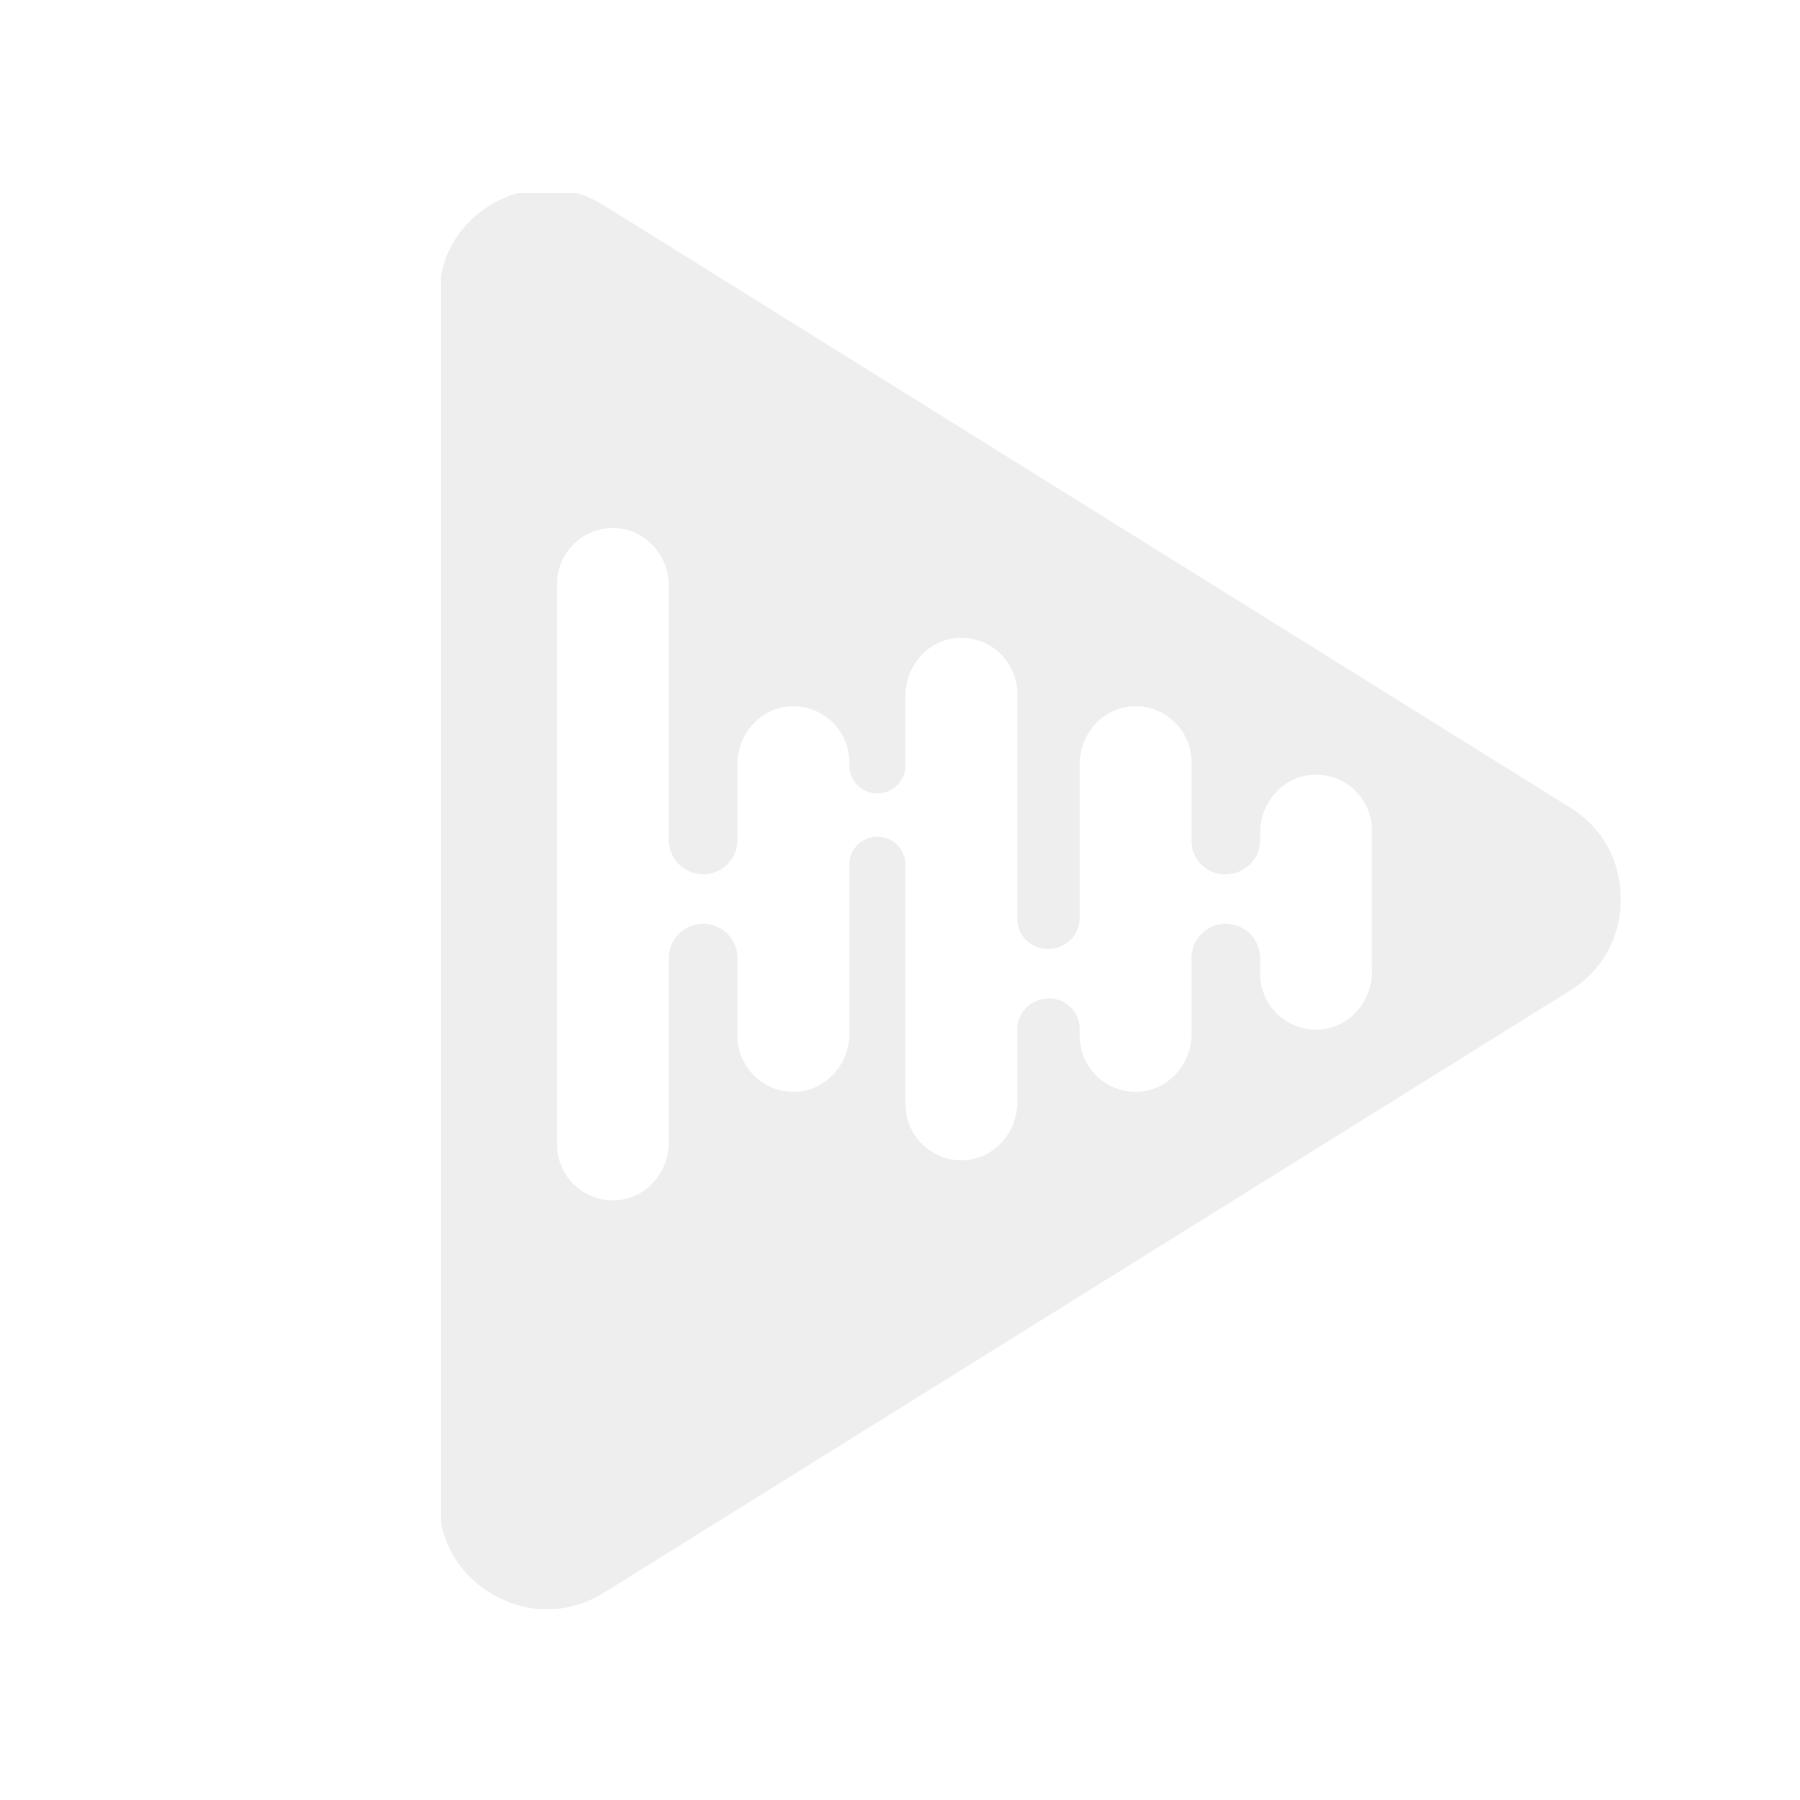 Pioneer CA-IW.51V iPod-/iPhone-USB kabel (lyd+bilde iPhone 4)